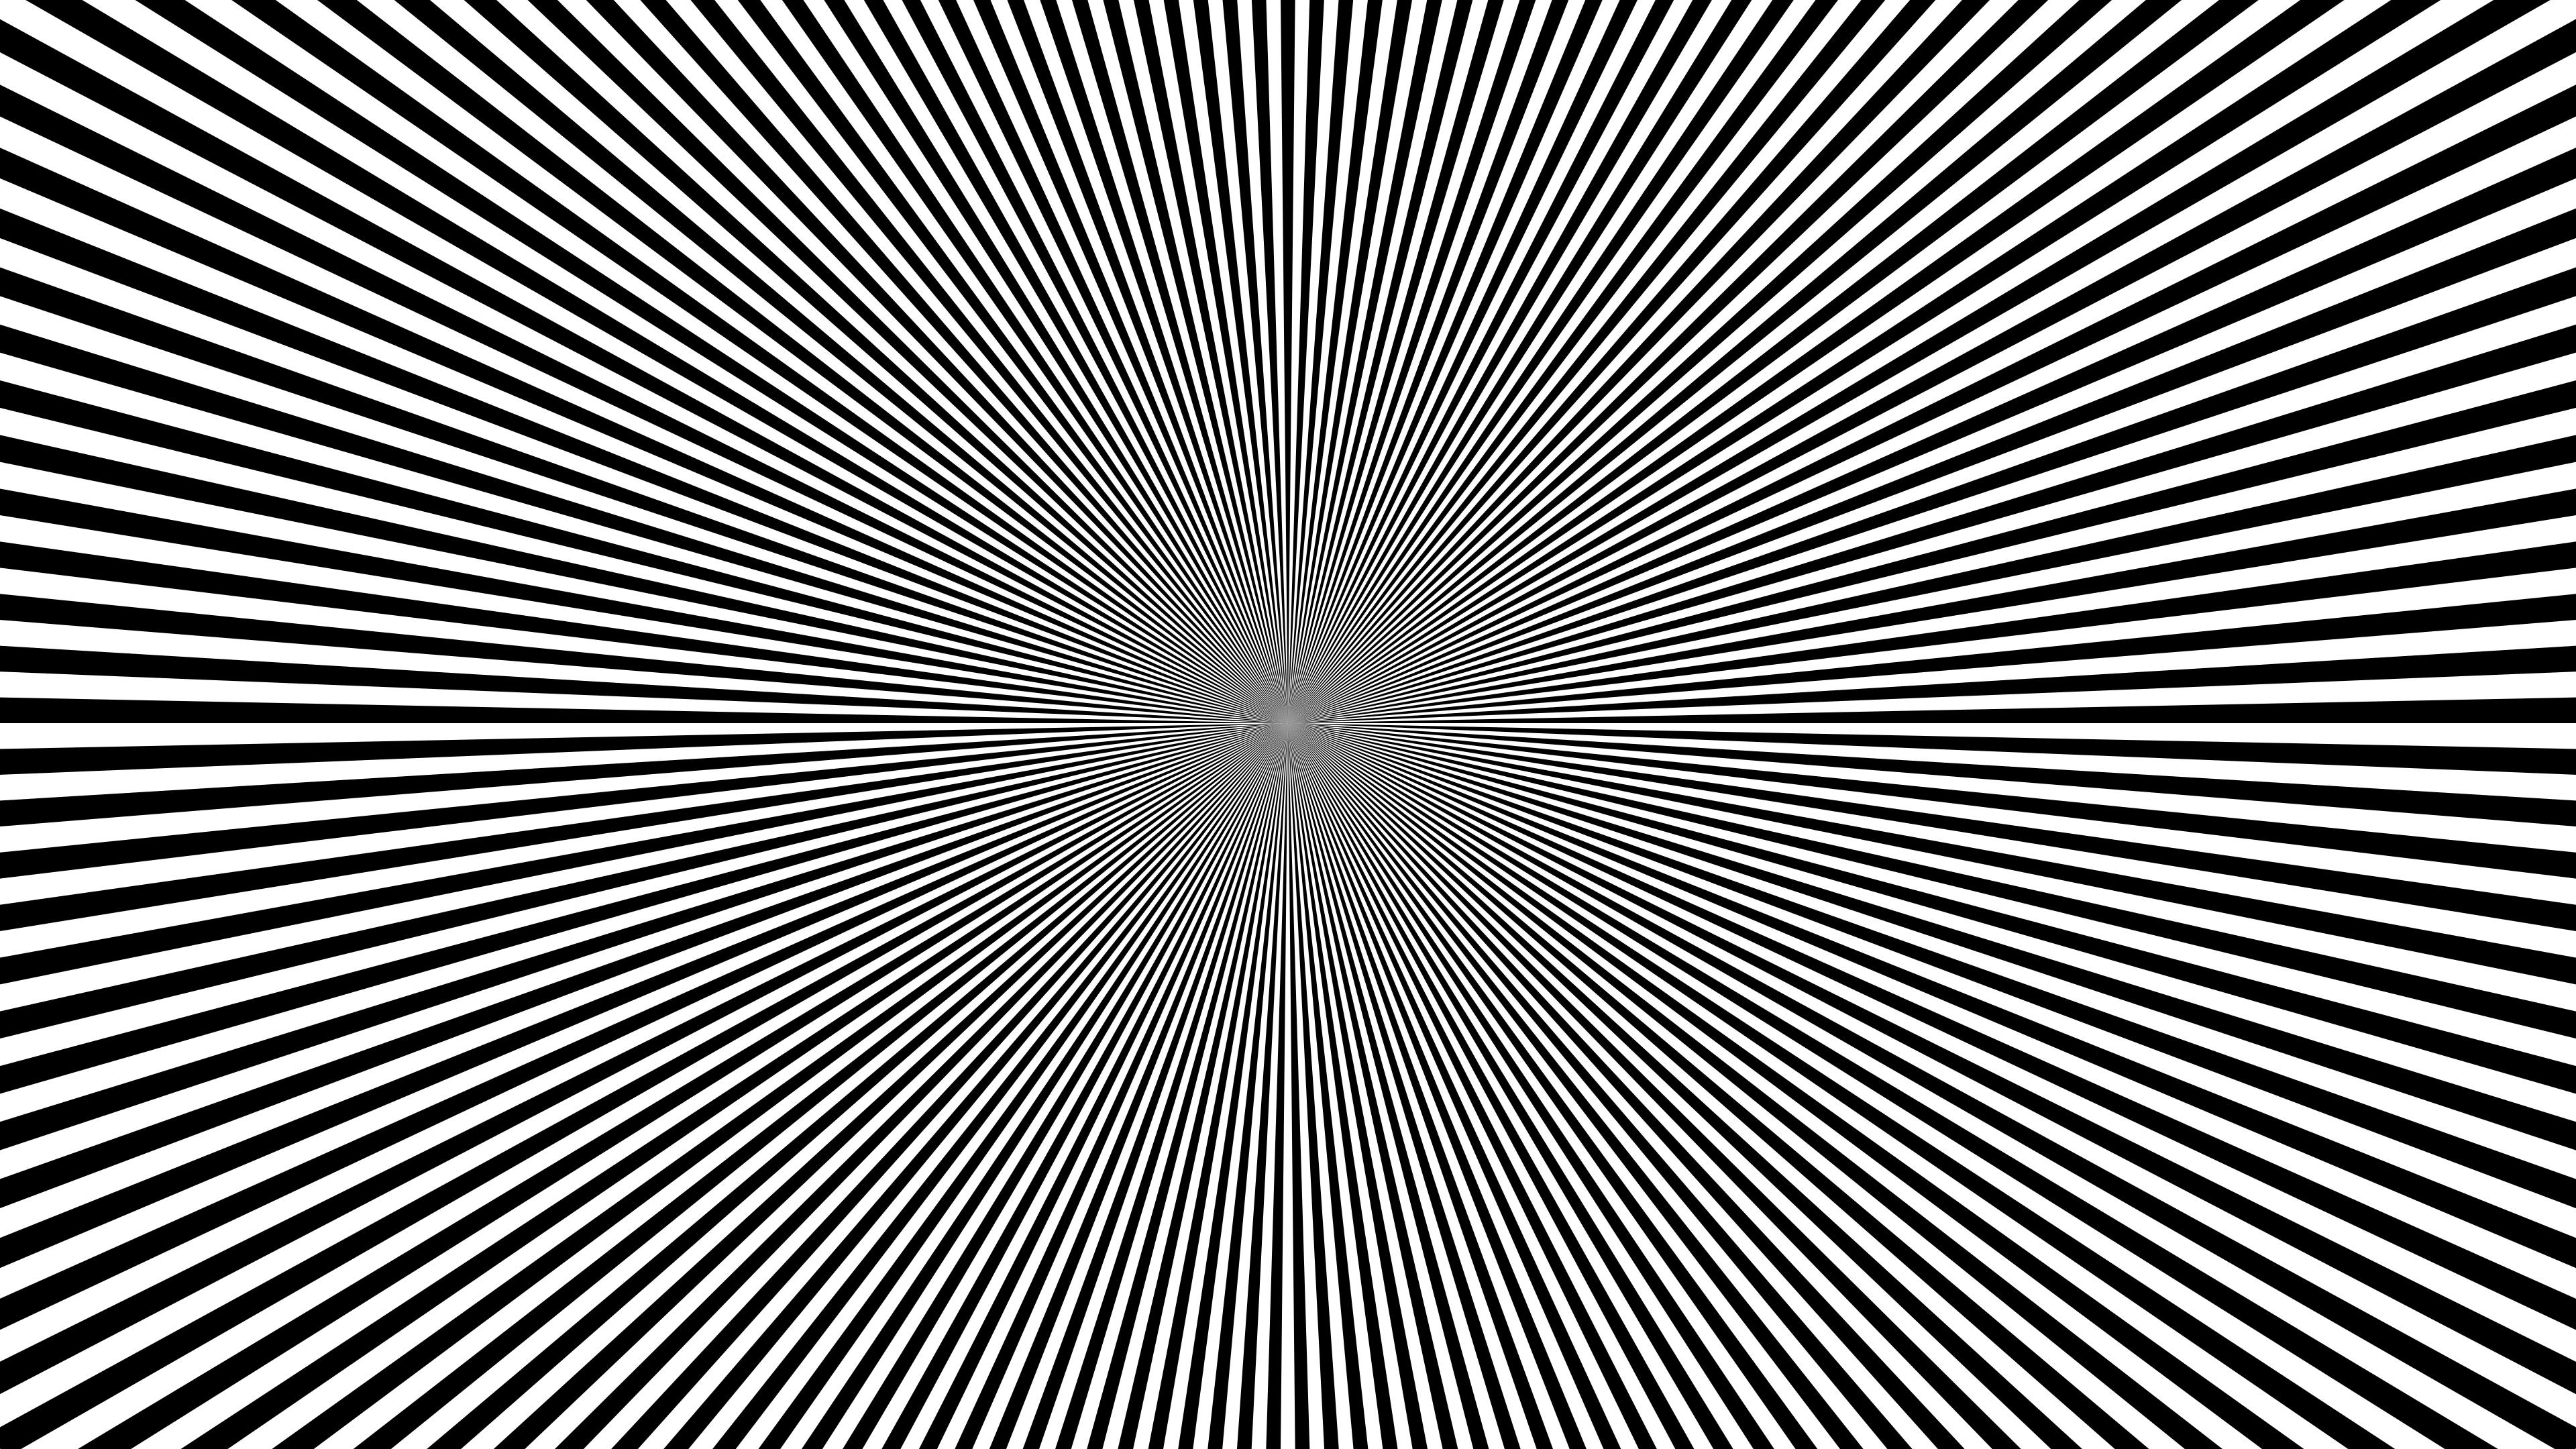 General 3840x2160 sunburst Radial test patterns pattern geometry geometric figures bright simple optical illusion contrast monochrome trippy